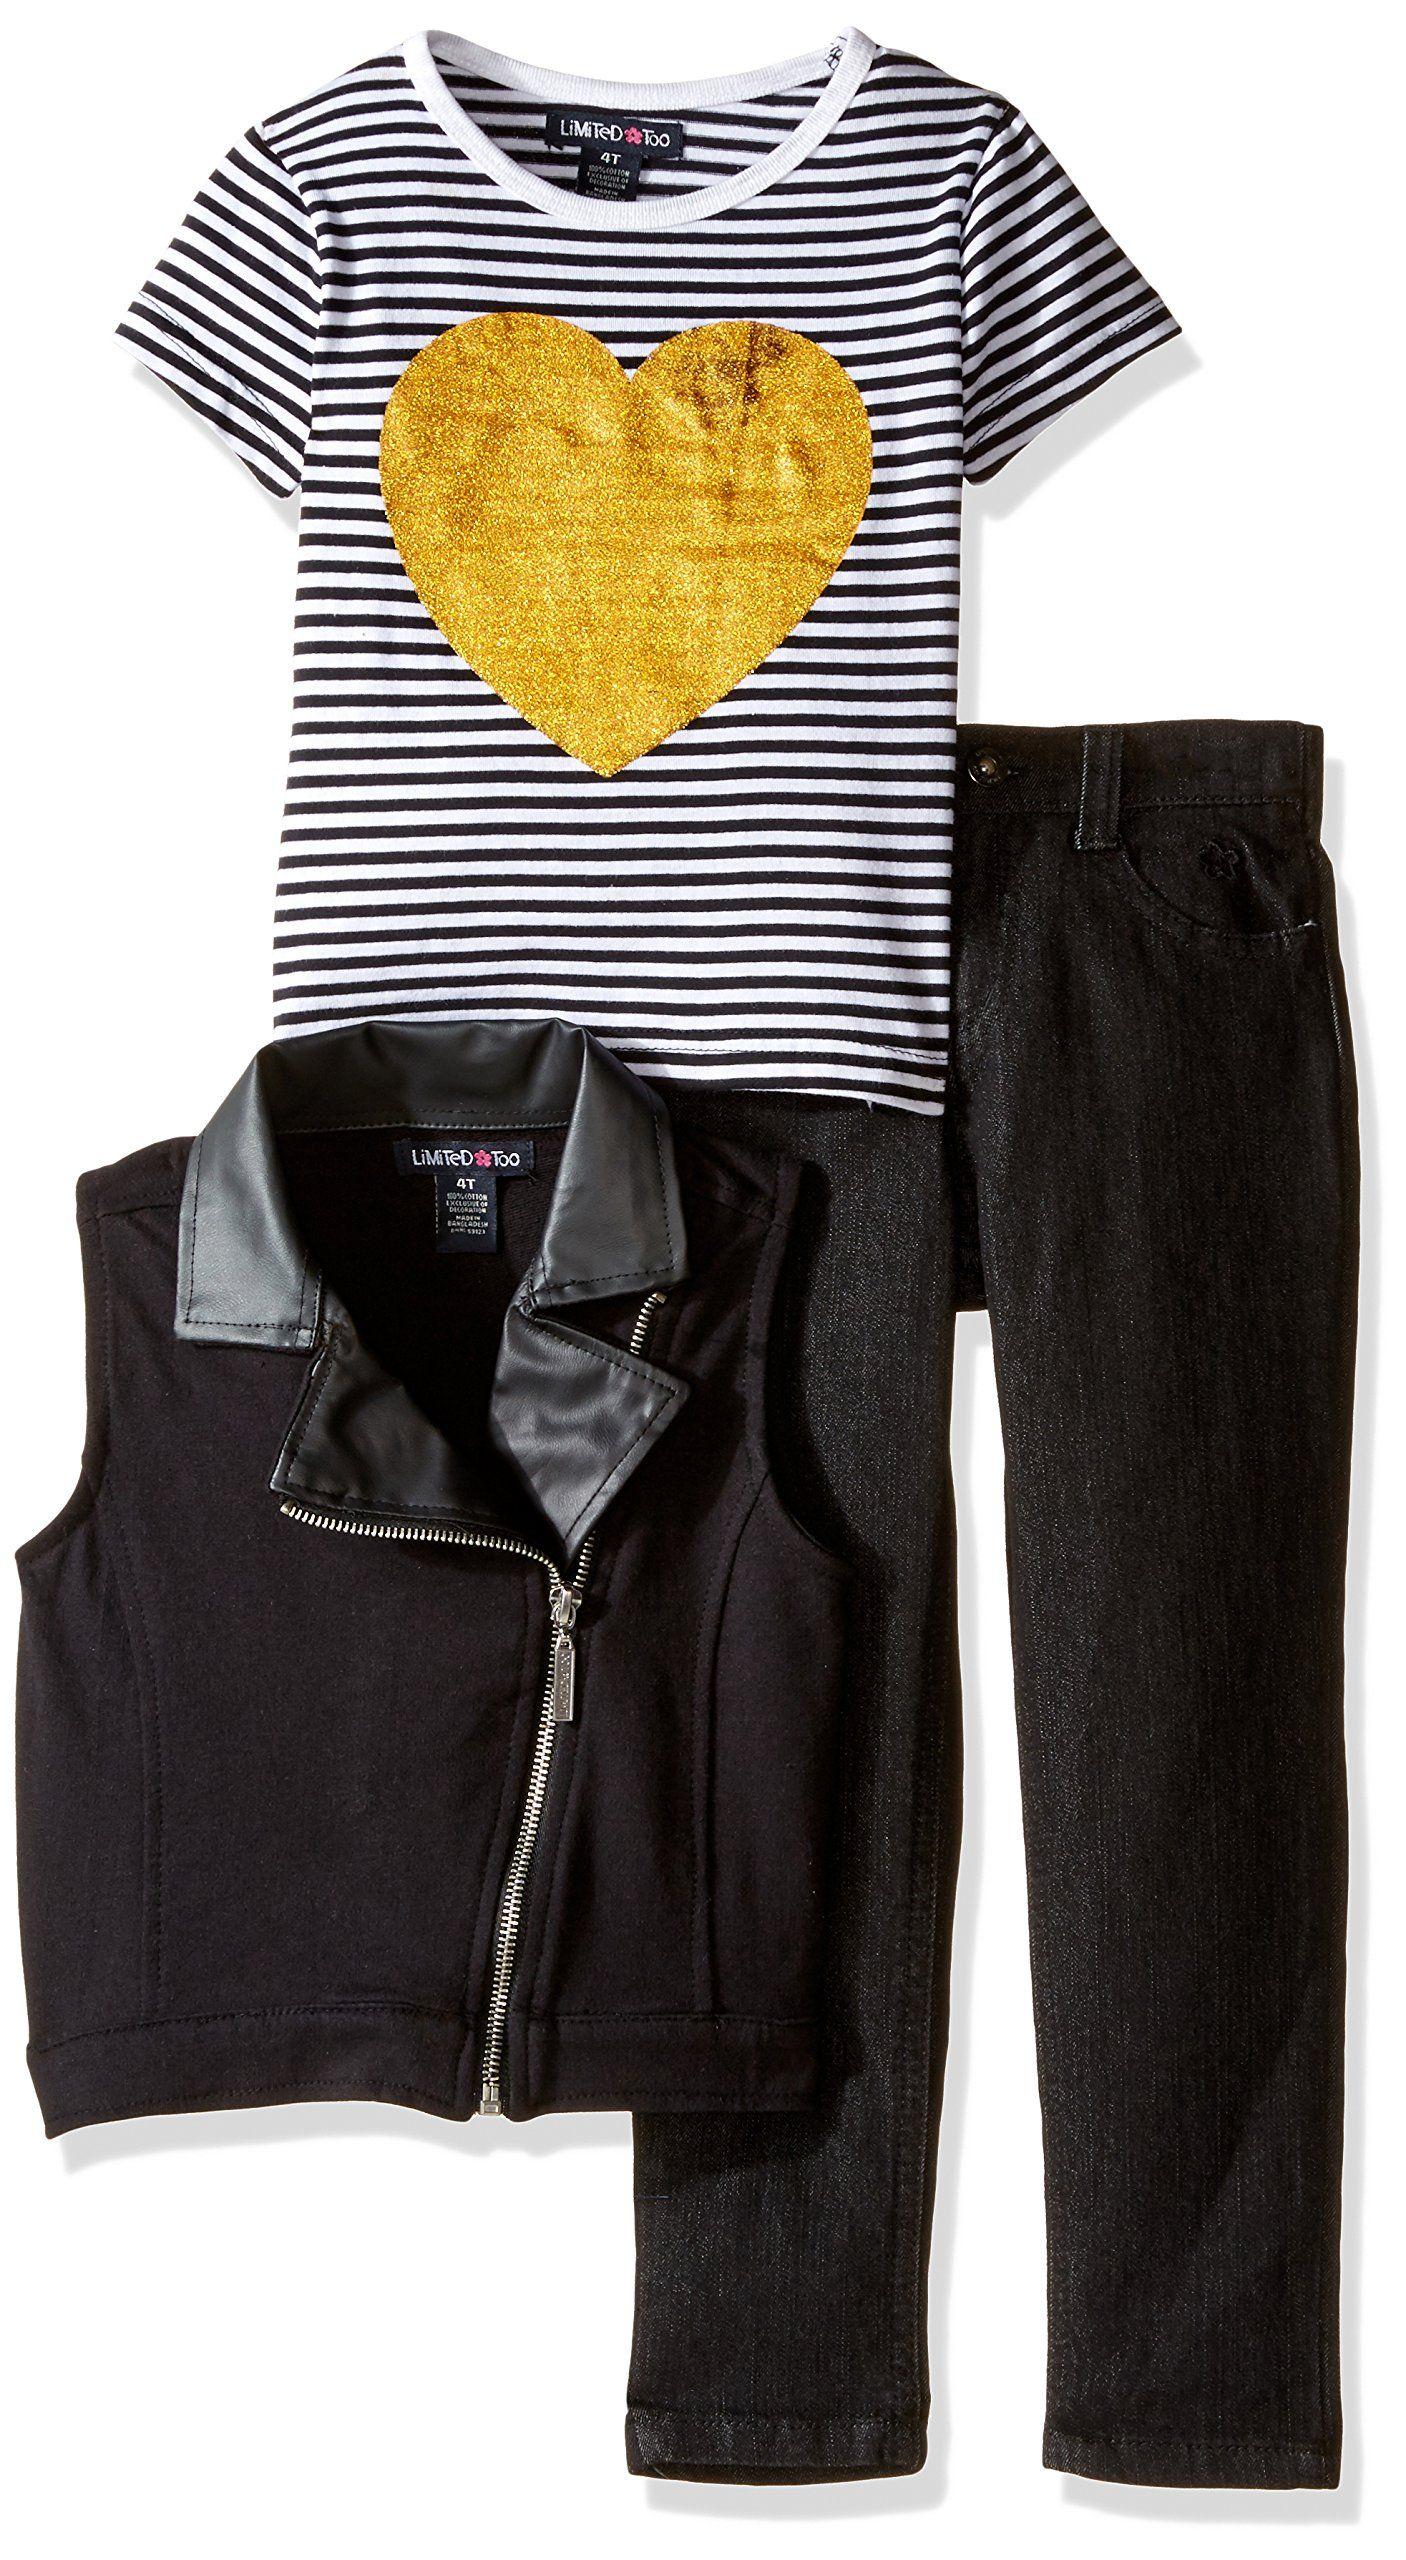 Limited Too Girls Denim Jacket and Dress Set